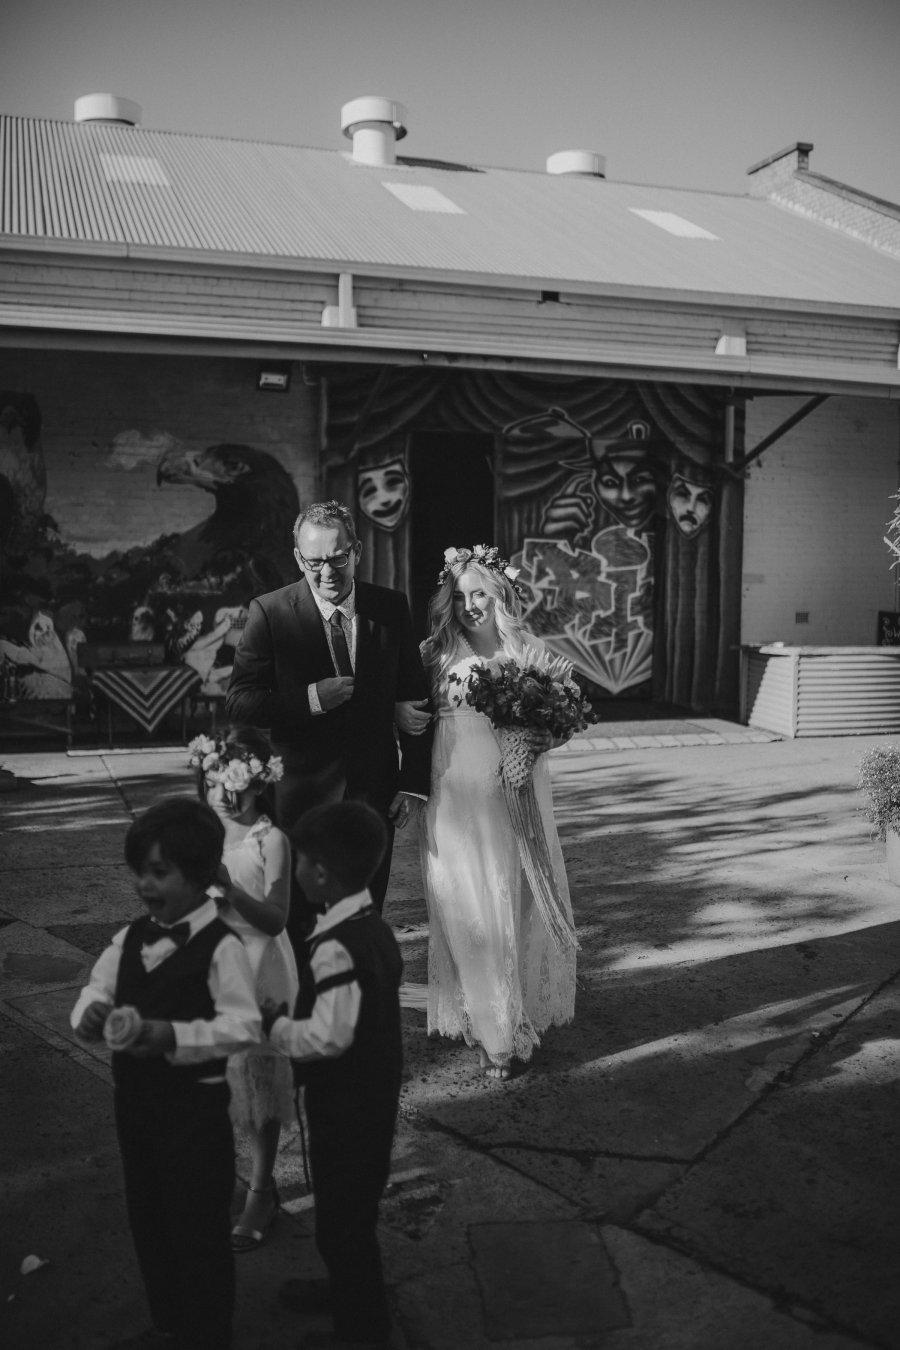 Ebony Blush Photography   Perth wedding Photographer   Perth City Farm Wedding   Imogen + Tristian58-2